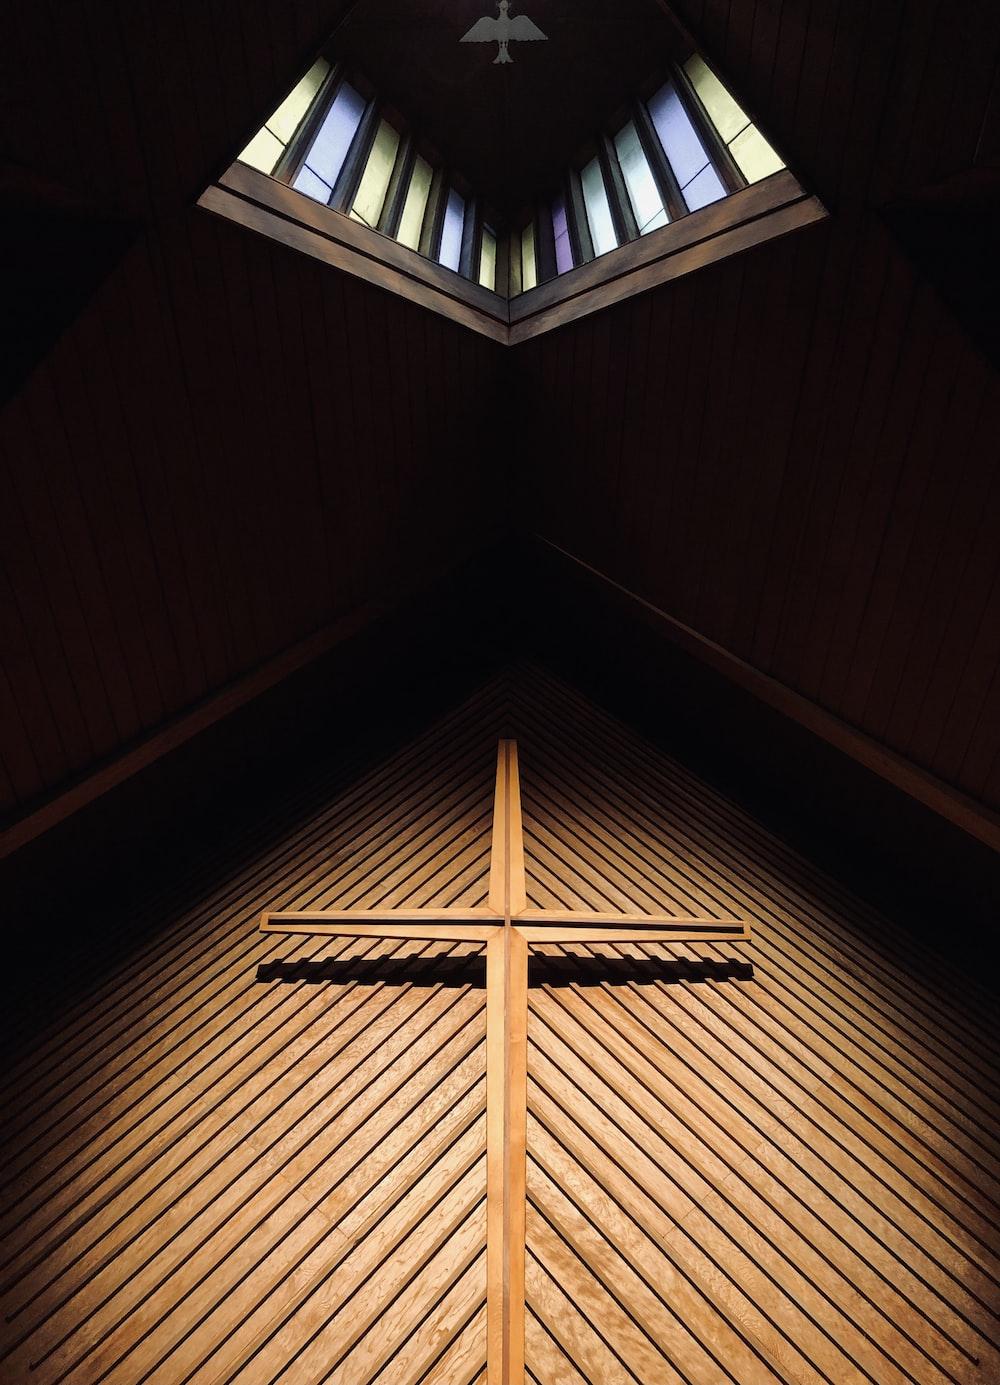 brown wooden cross on brown wooden ceiling